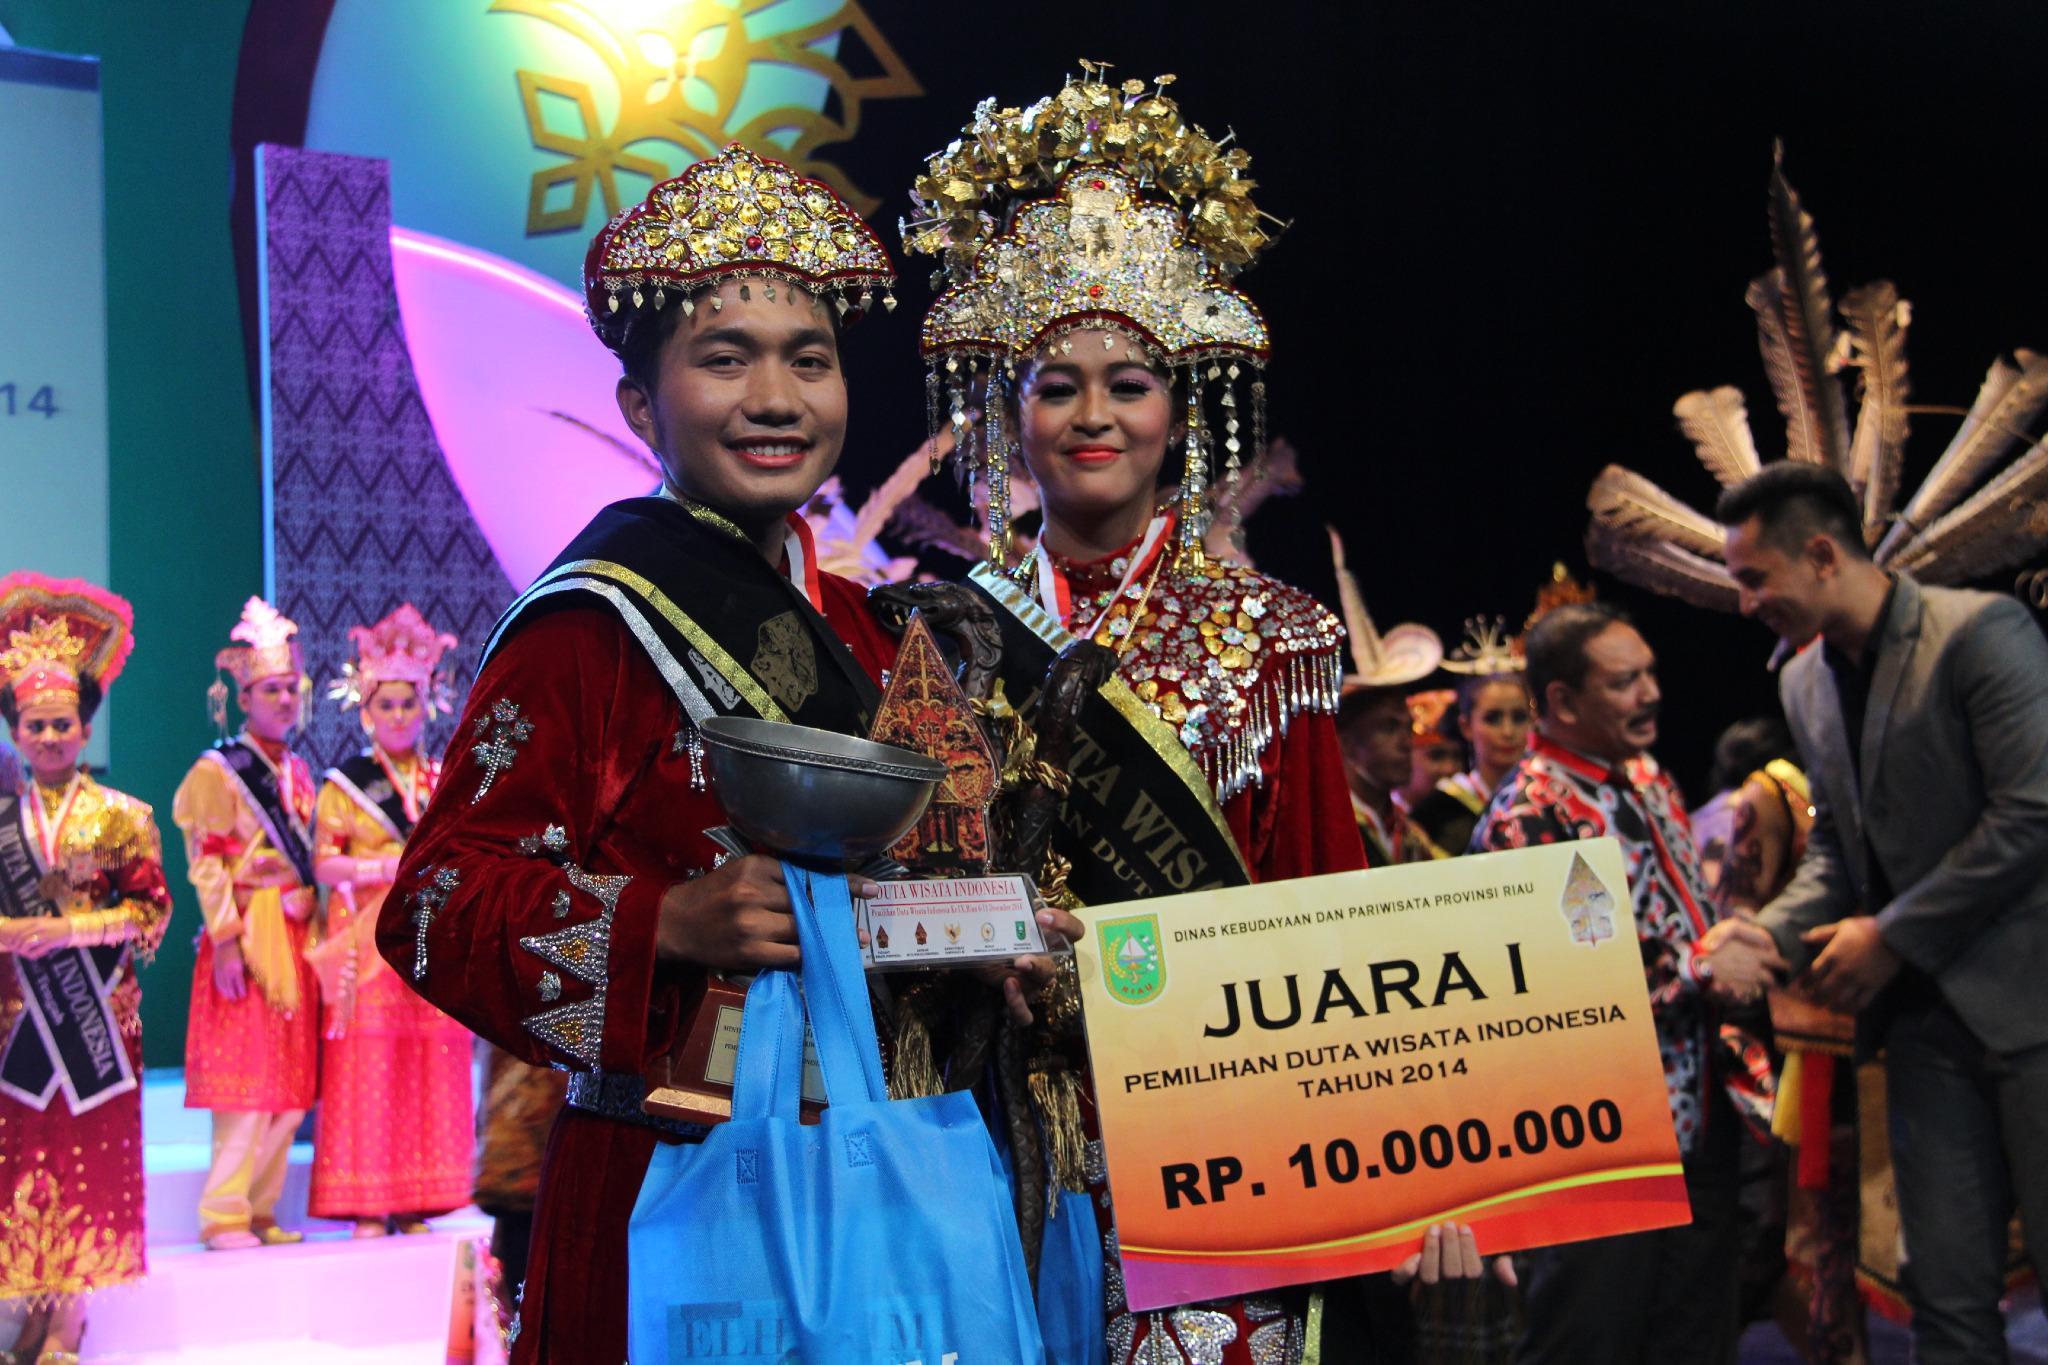 Duta Wisata Bangka Belitung Menangi Pemilihan Duta Wisata Indonesia 2014